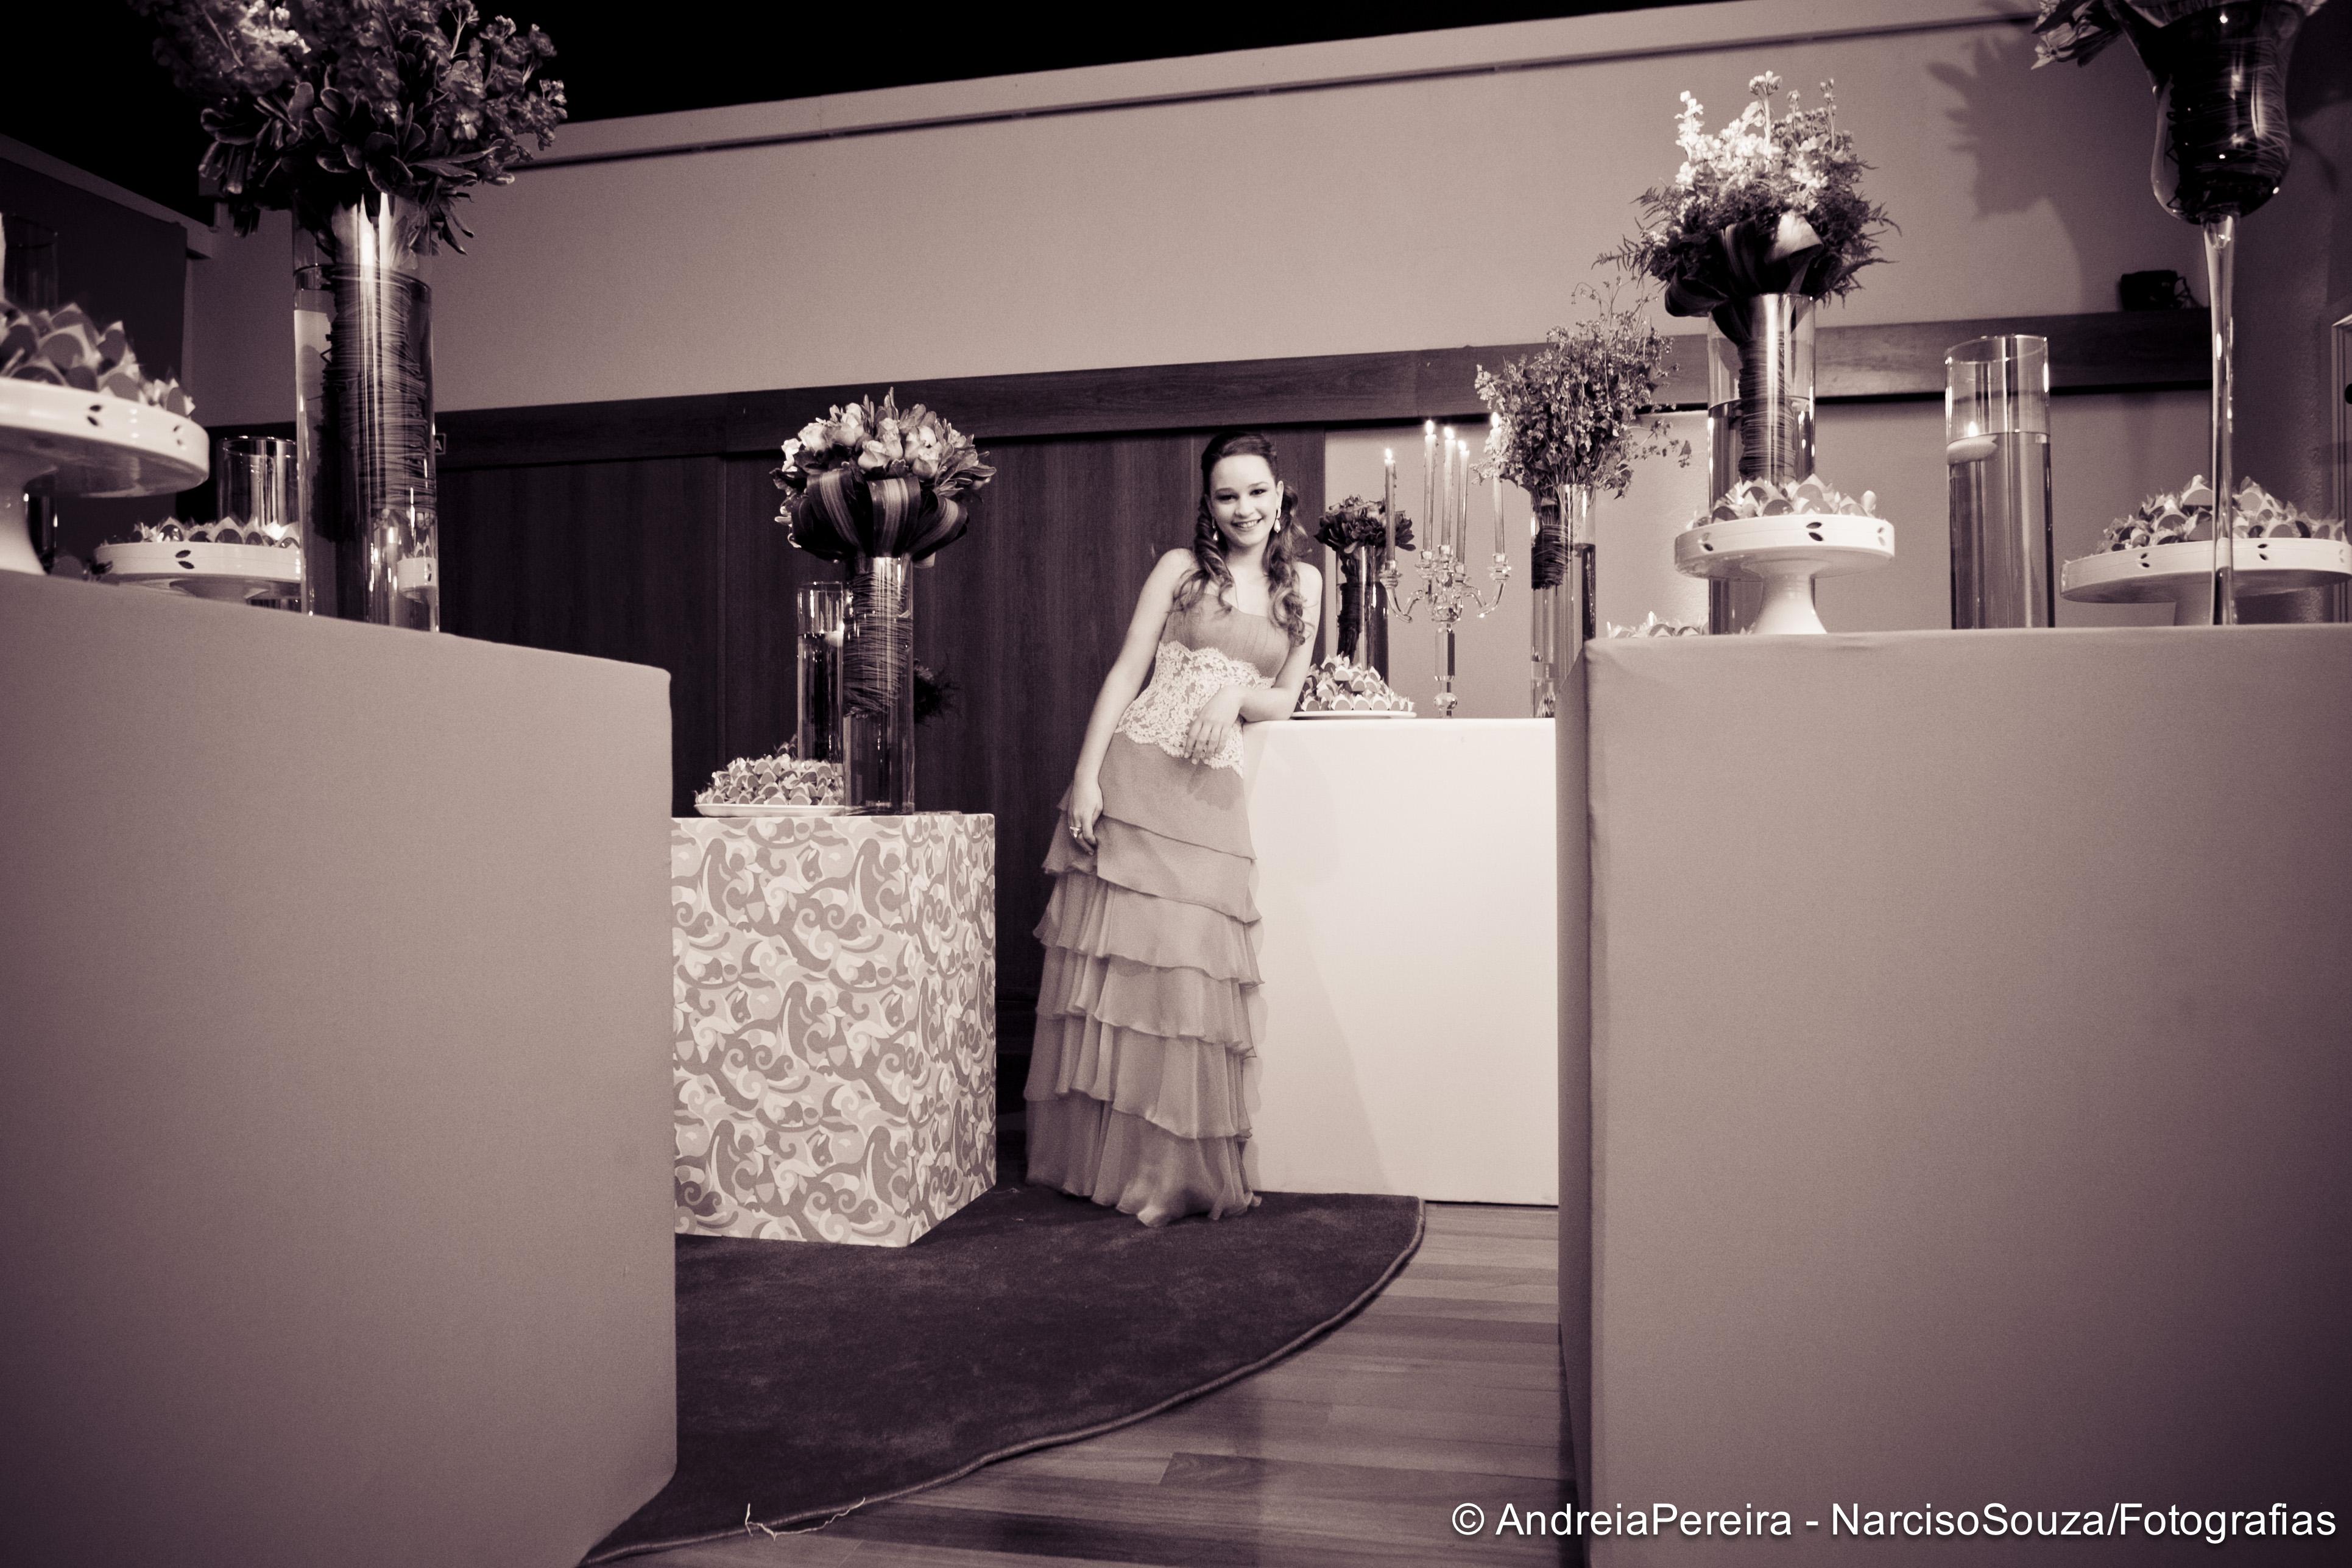 20111104 aniversario thais mendes 246 Fifteen years Thais / Fotos fotografo